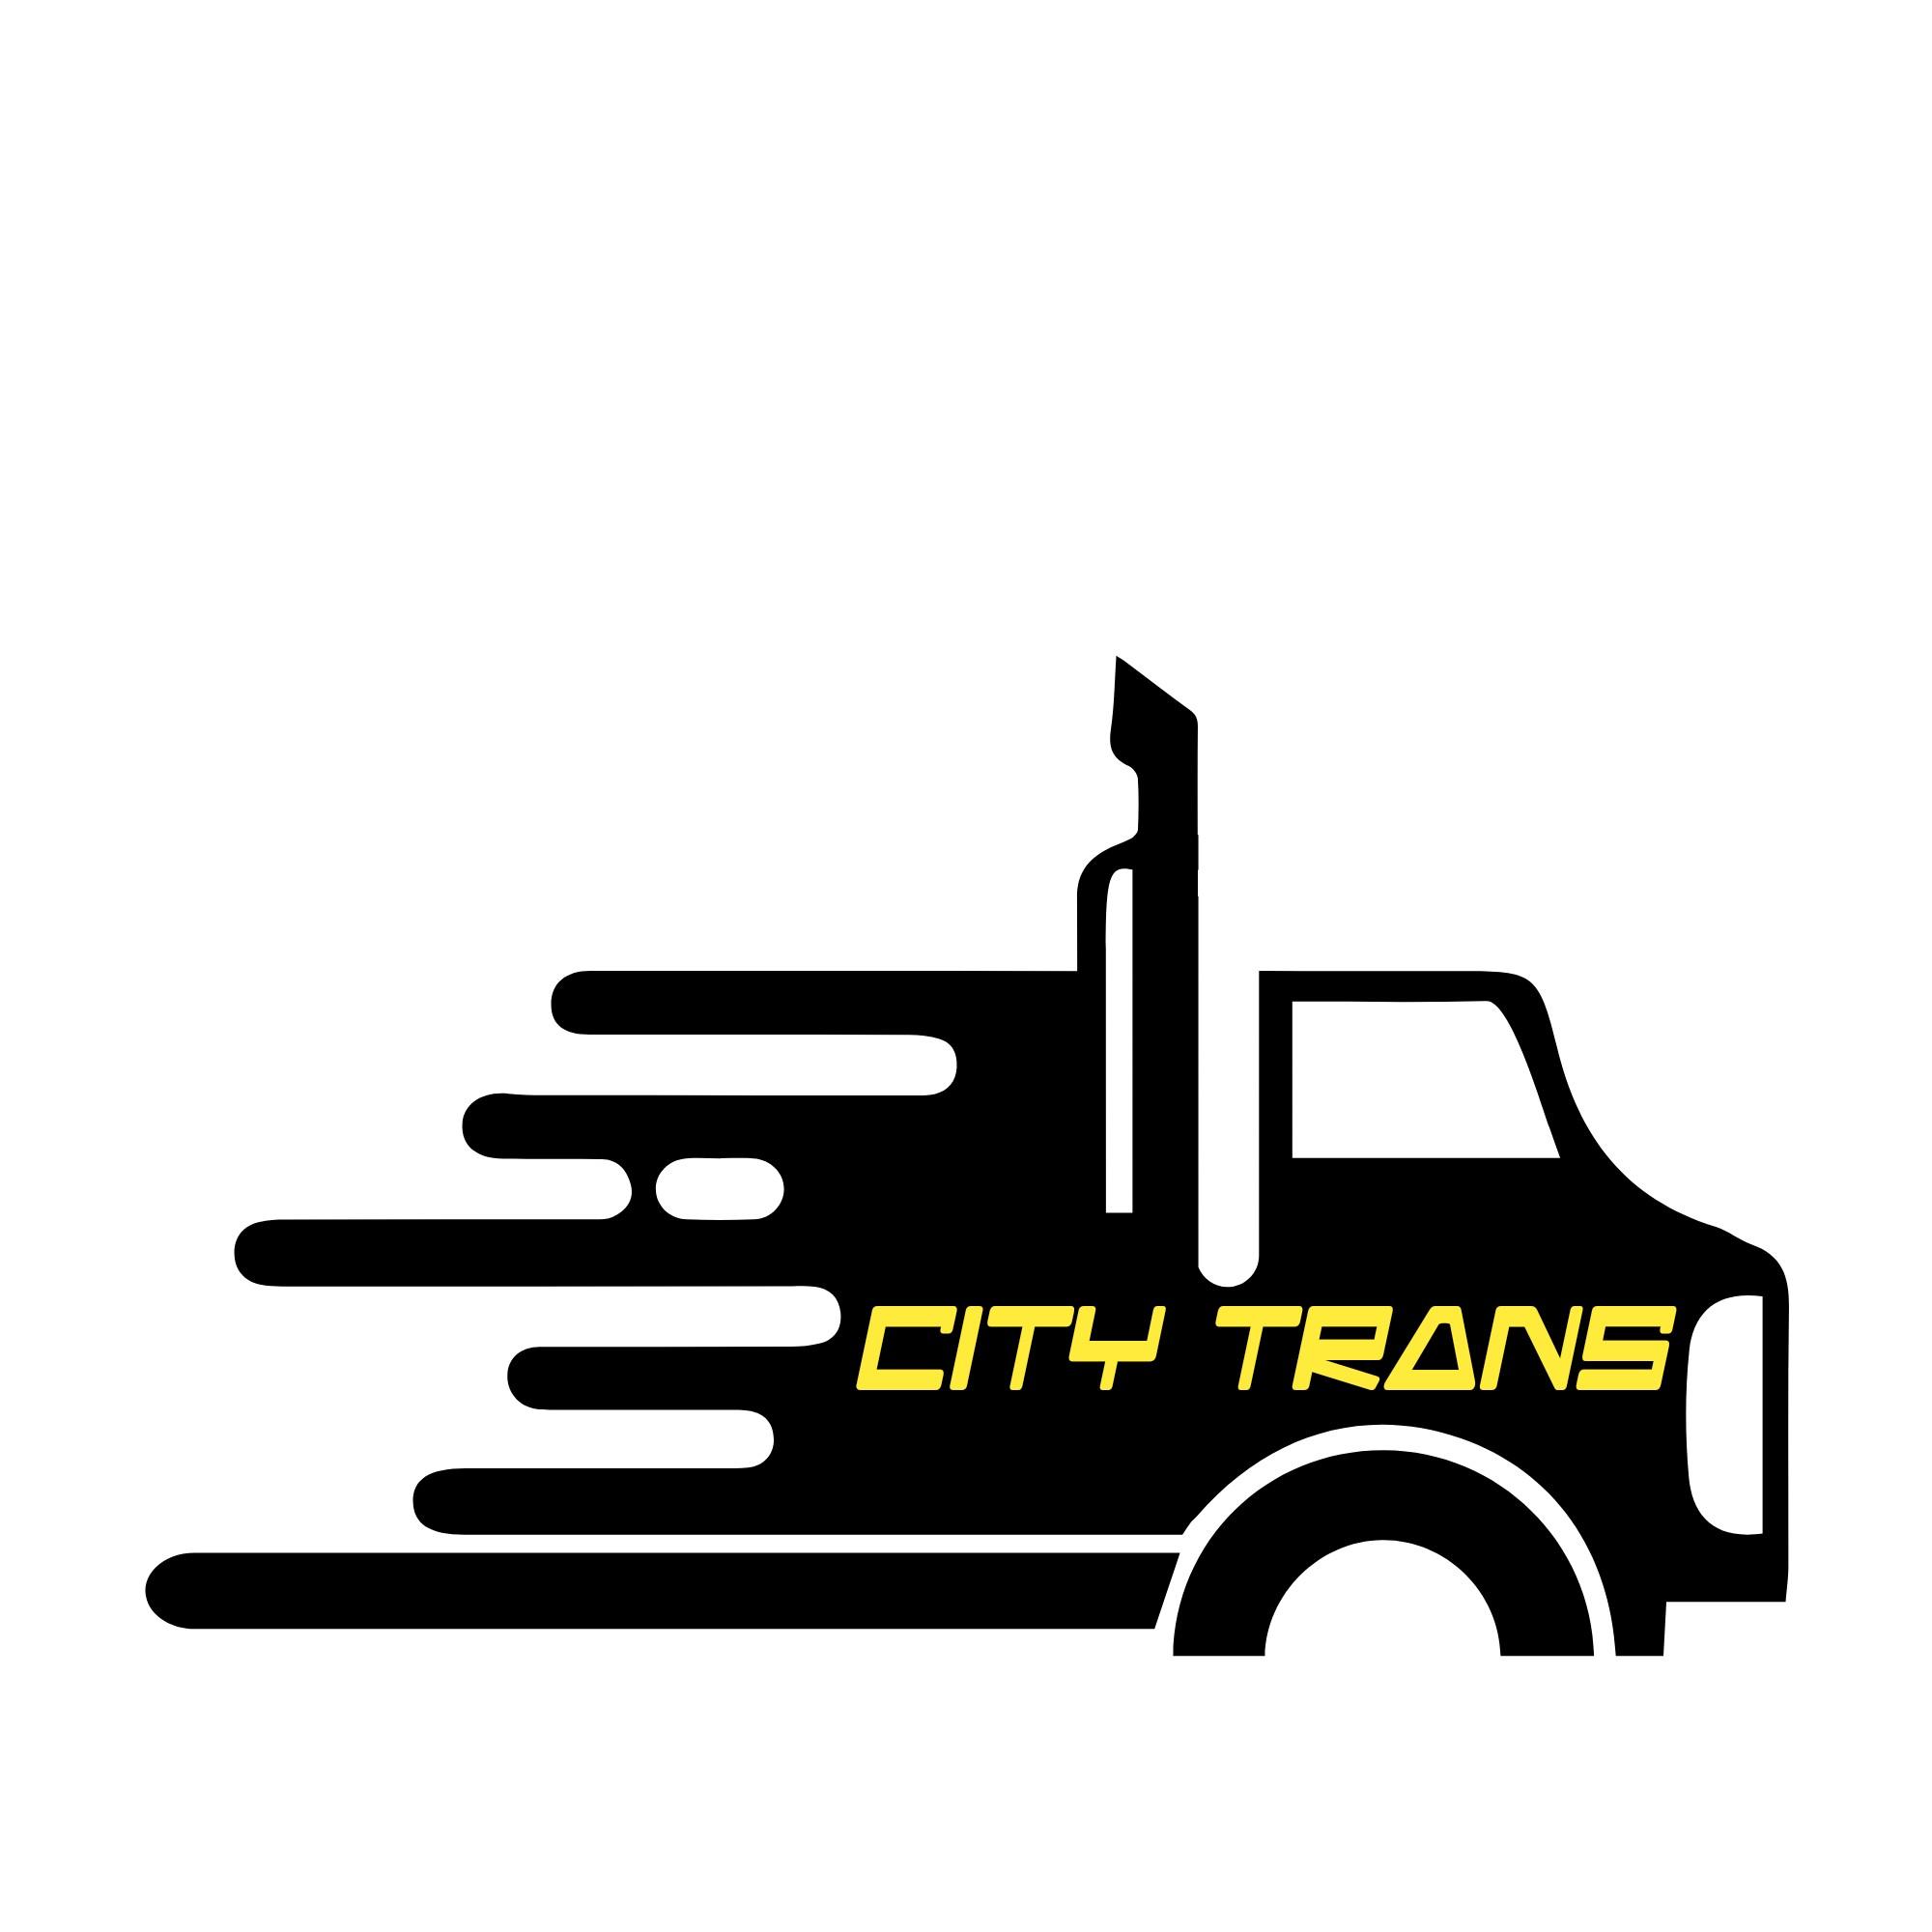 Разработка Логотипа транспортной компании фото f_0395e6ceb3d40176.jpg